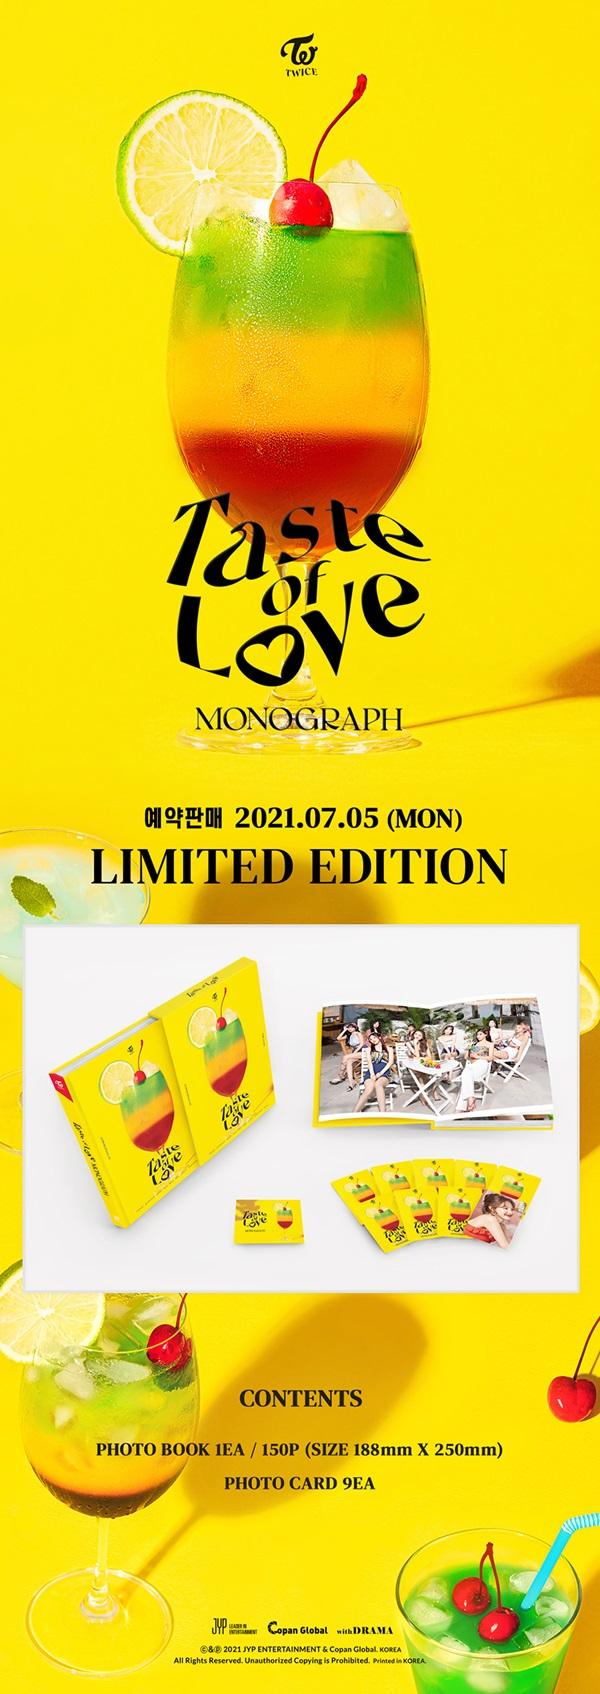 TWICE MONOGRAPH Taste of Love